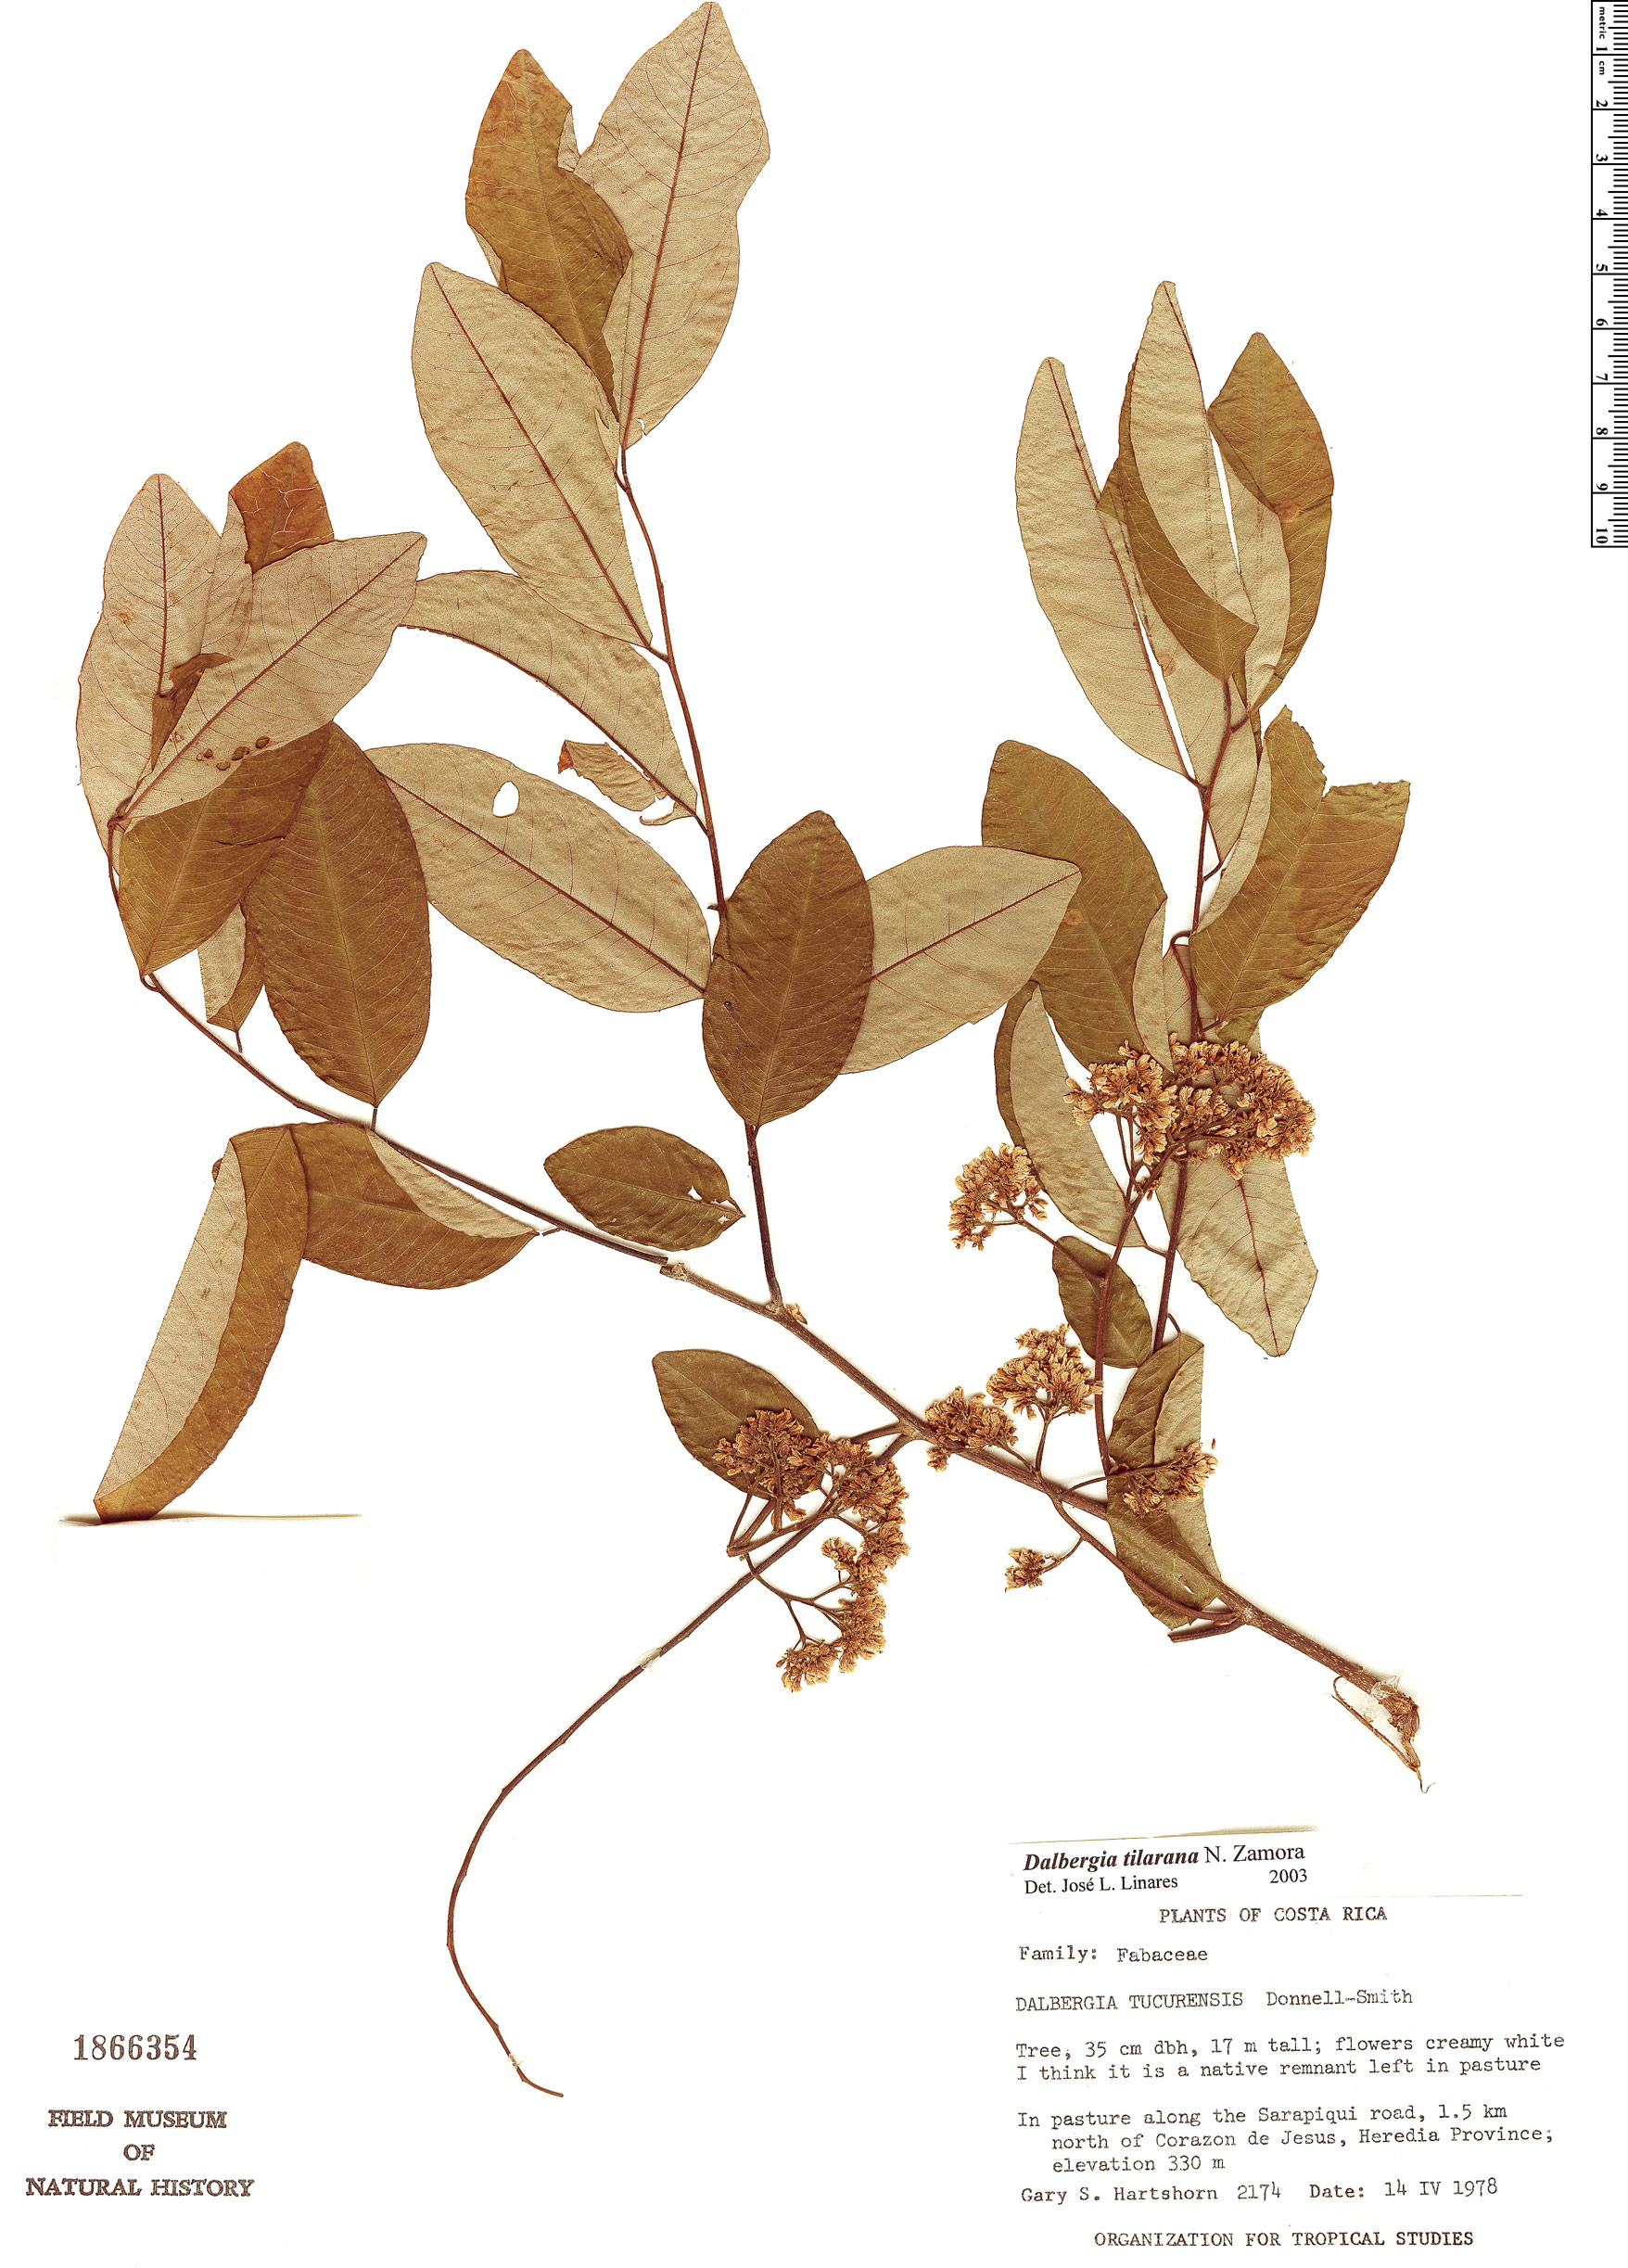 Specimen: Dalbergia tilarana